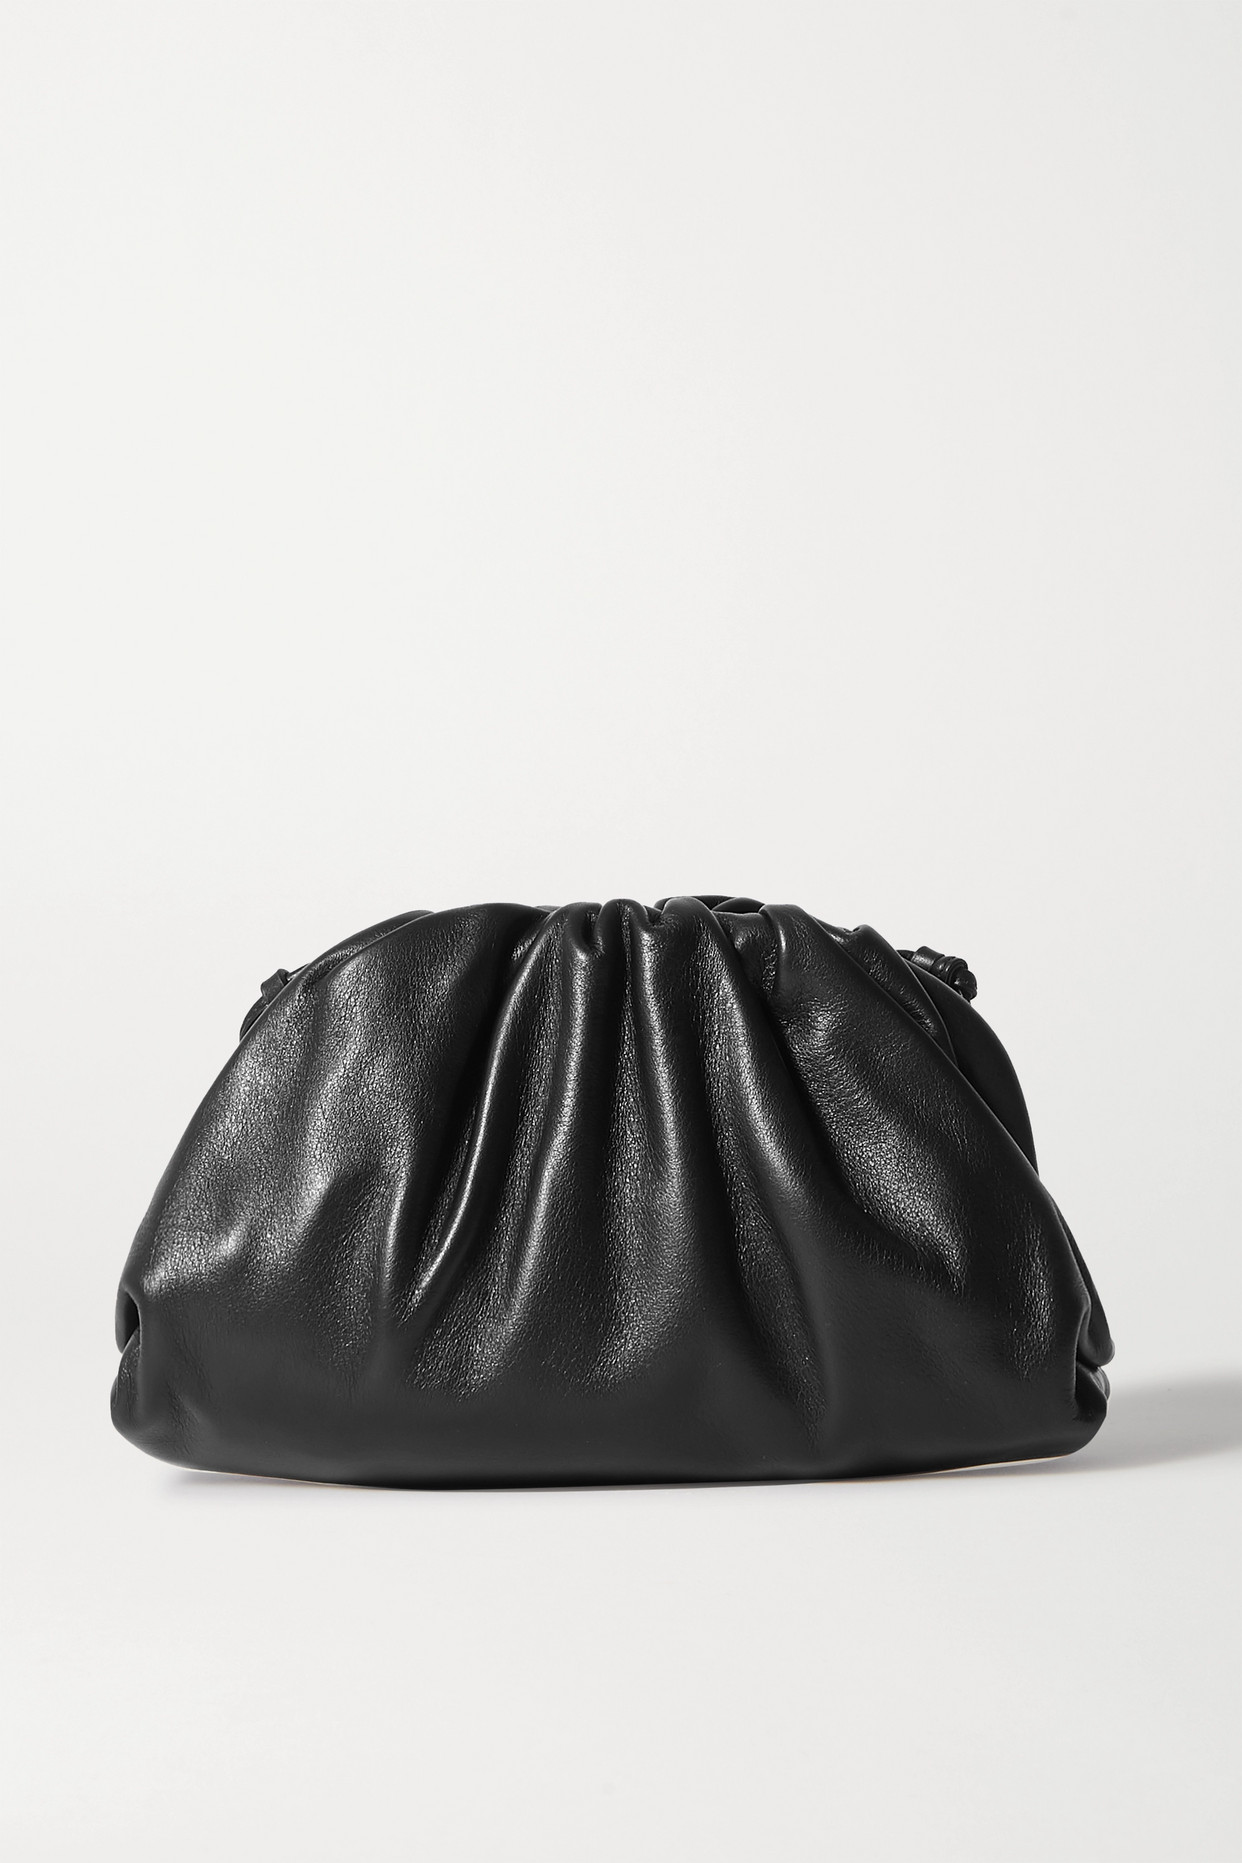 BOTTEGA VENETA - The Pouch Small Gathered Intrecciato Leather Clutch - Black - one size